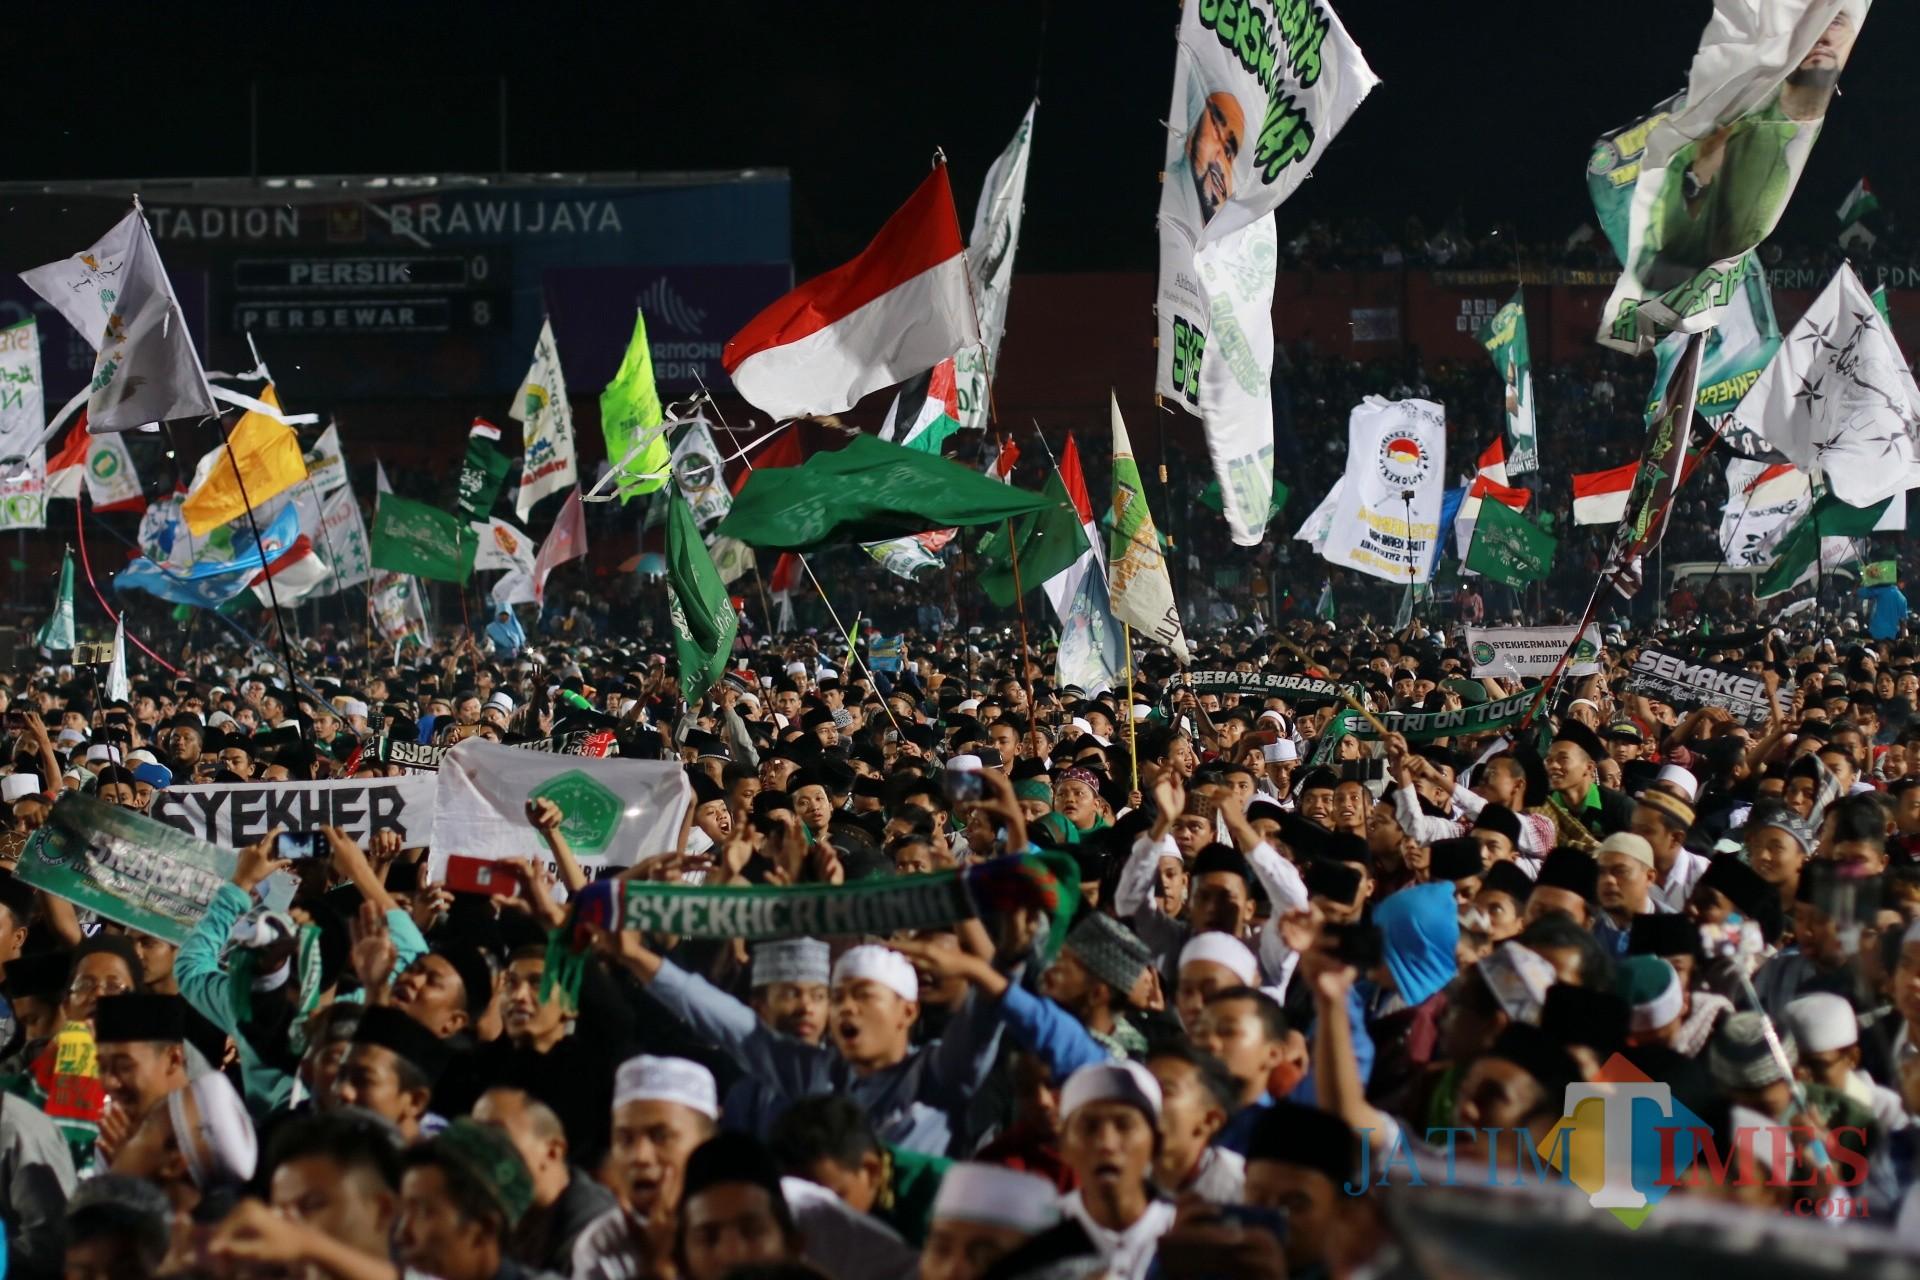 Warga memadati lokasi Kota Kediri Bersholawat di Stadion Brawijaya. (Foto: Bambang Setioko/JatimTIMES)